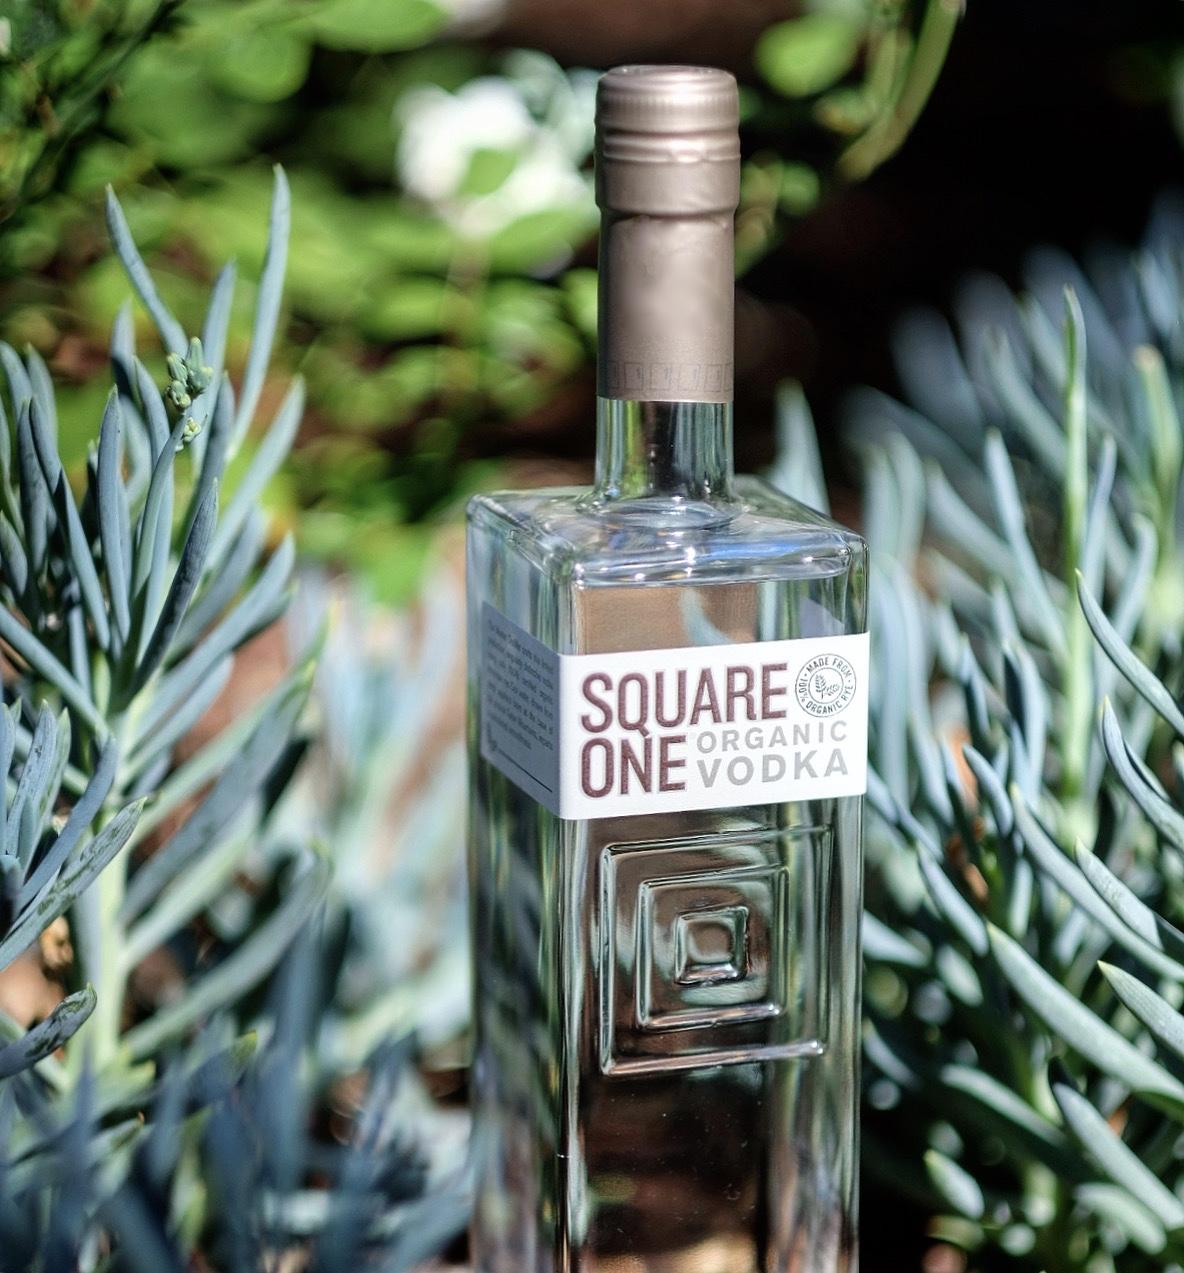 Square One Vodka by Timothy Kuratek